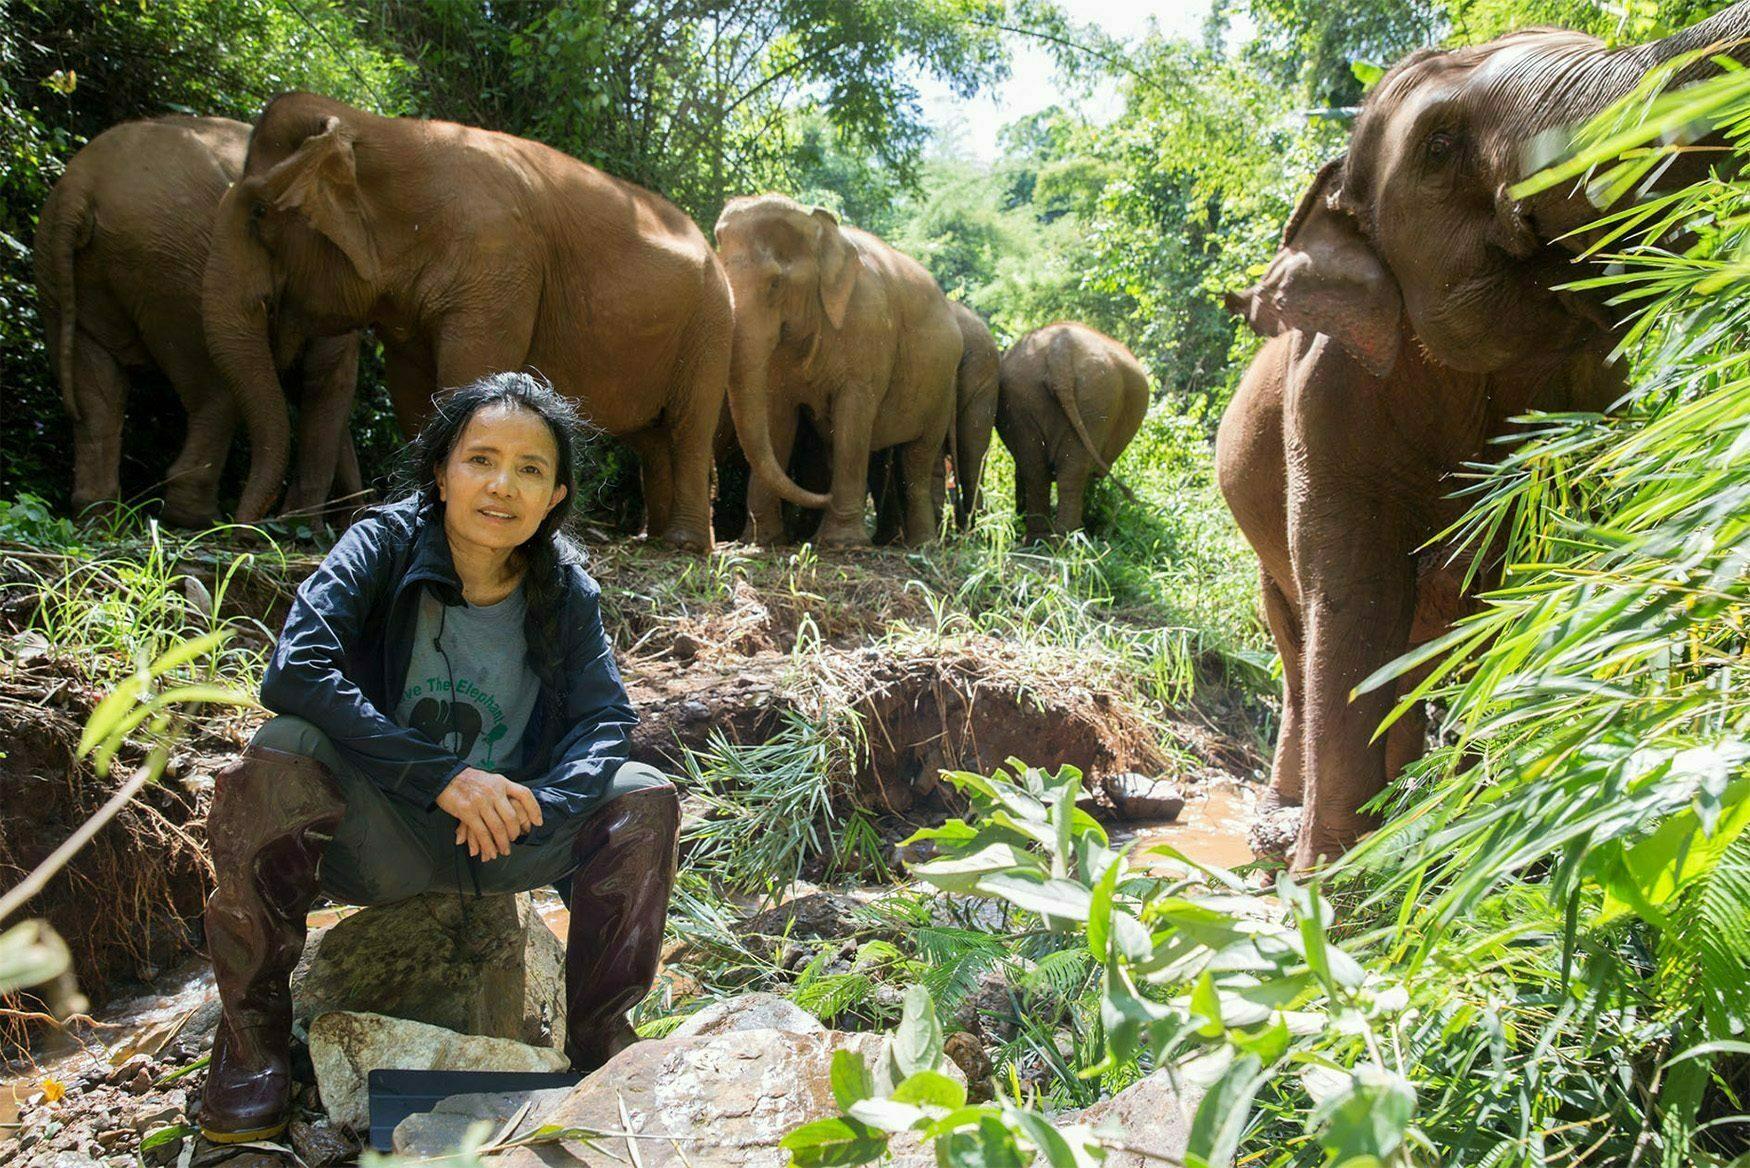 Lek Chailert with her elephants_m resized